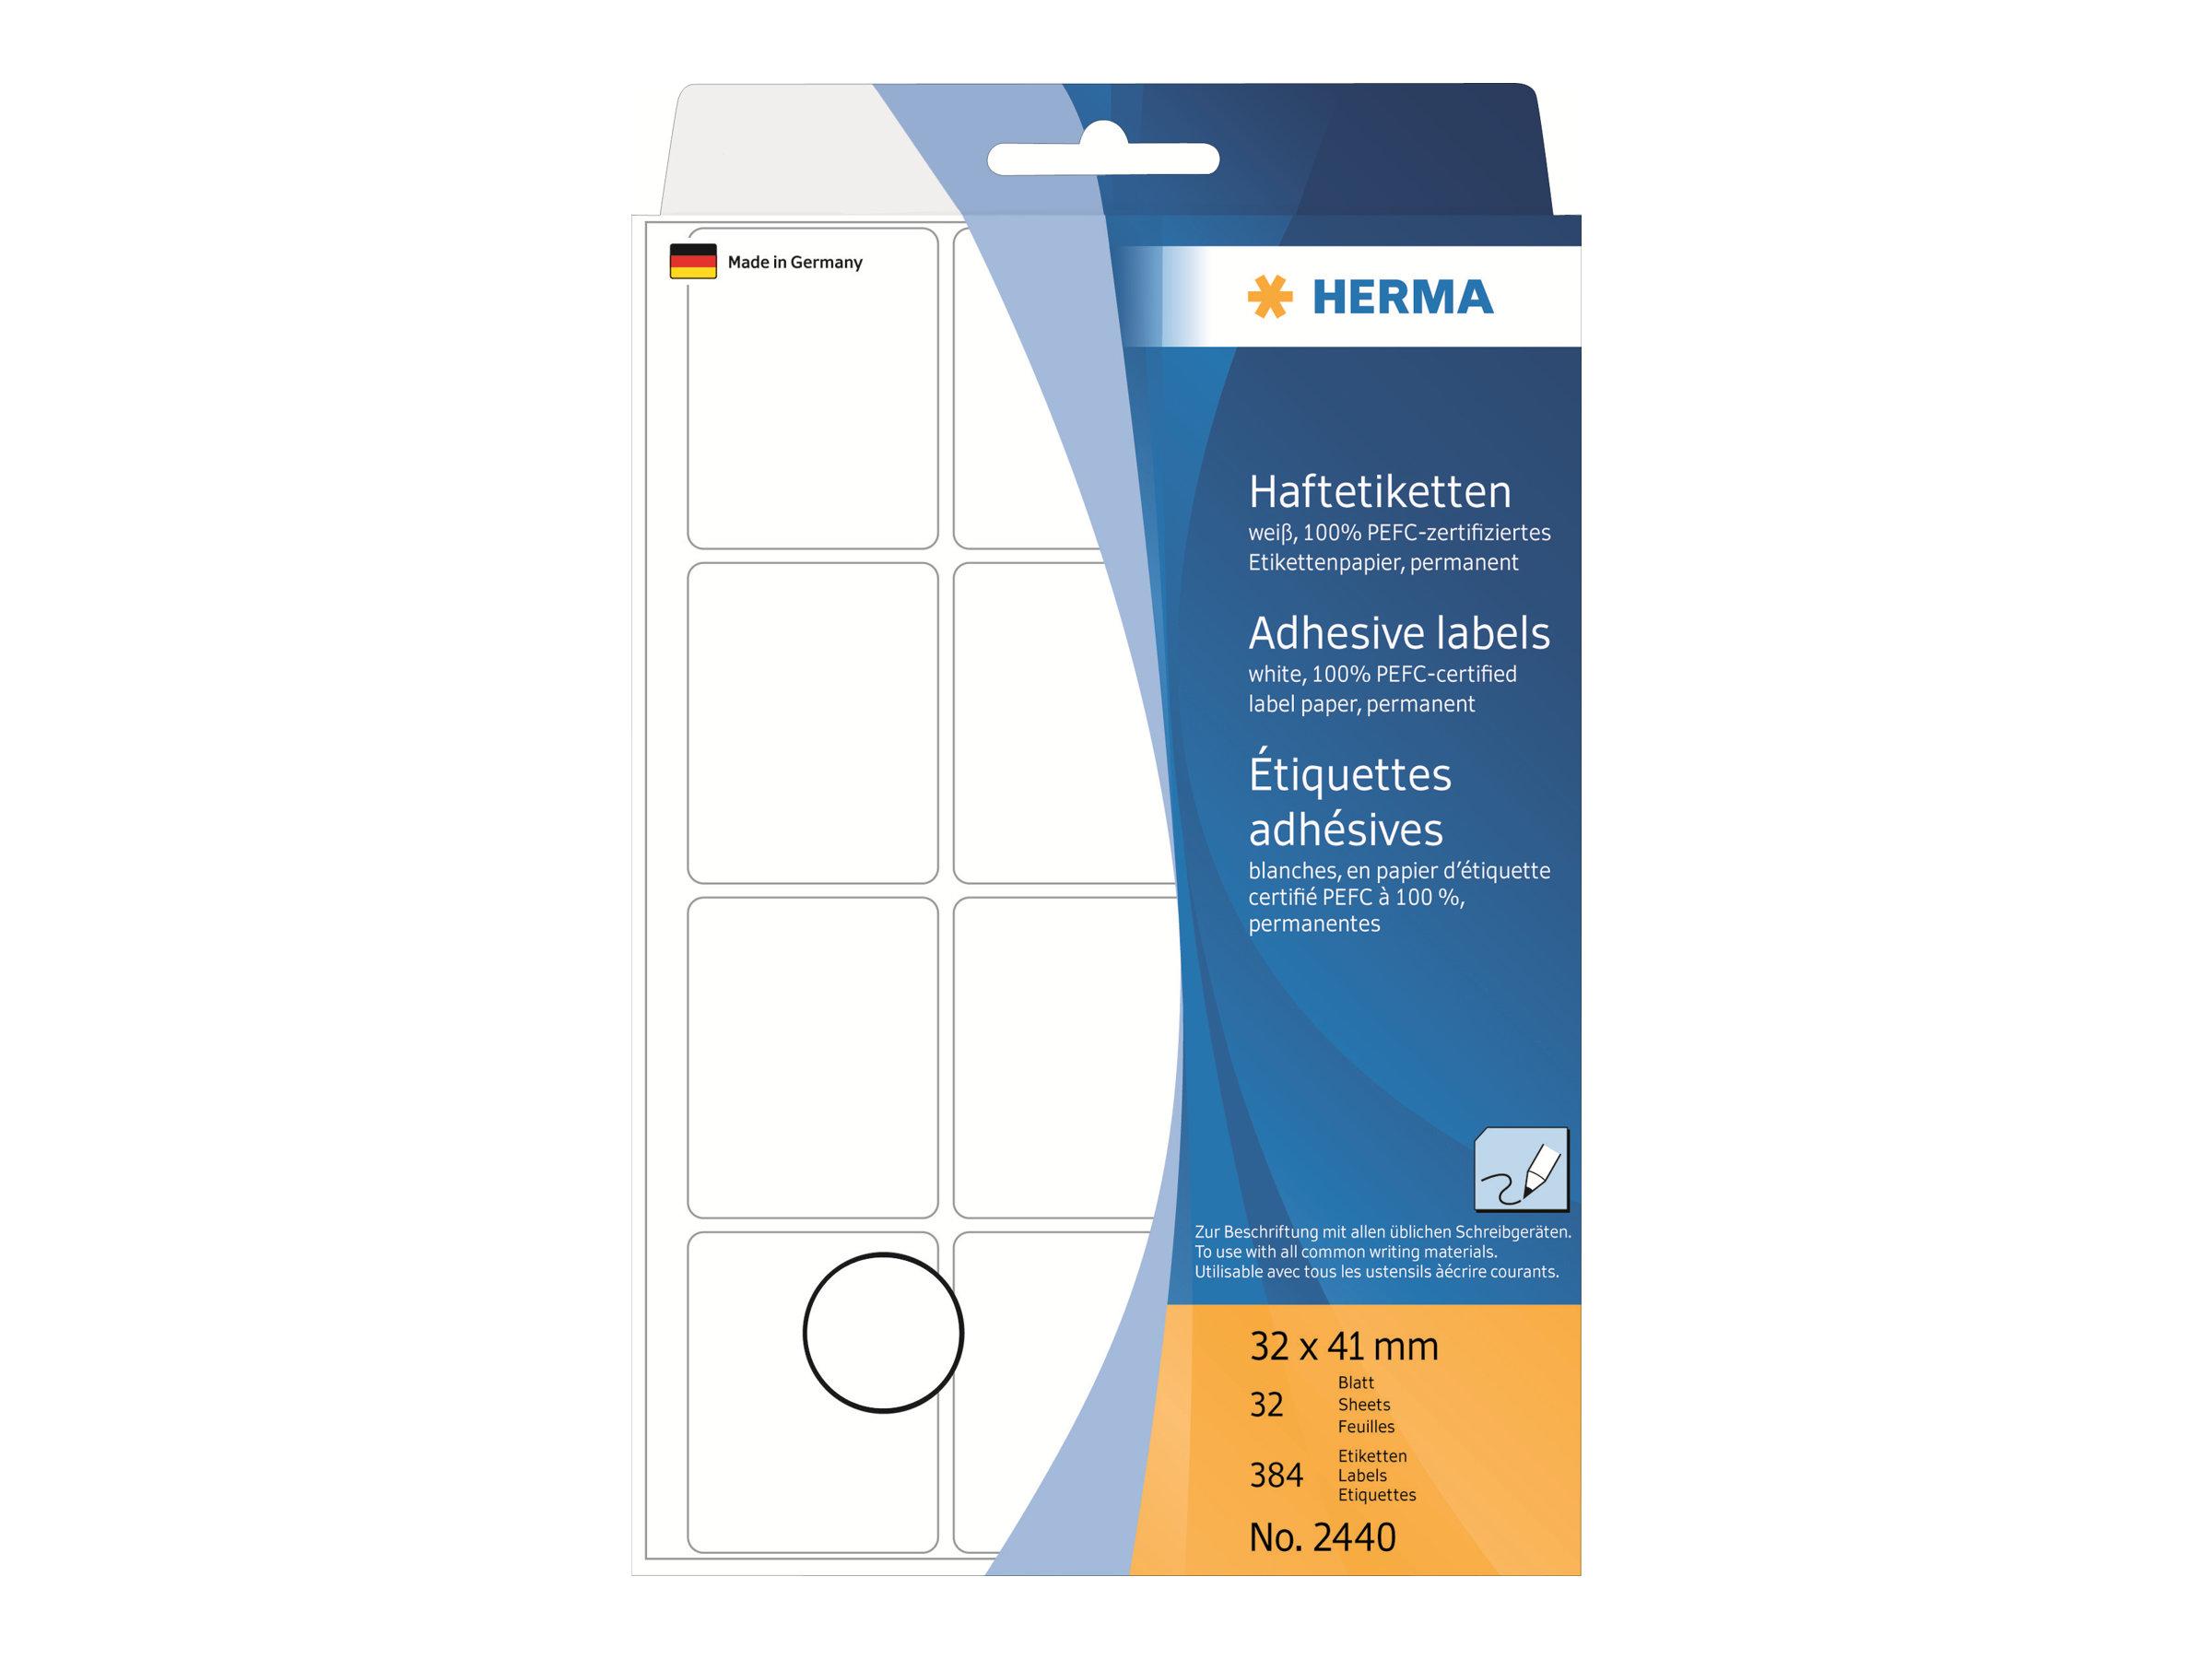 HERMA Permanenter Klebstoff - weiß - 32 x 41 mm 384 Etikett(en) (32 Bogen x 12)